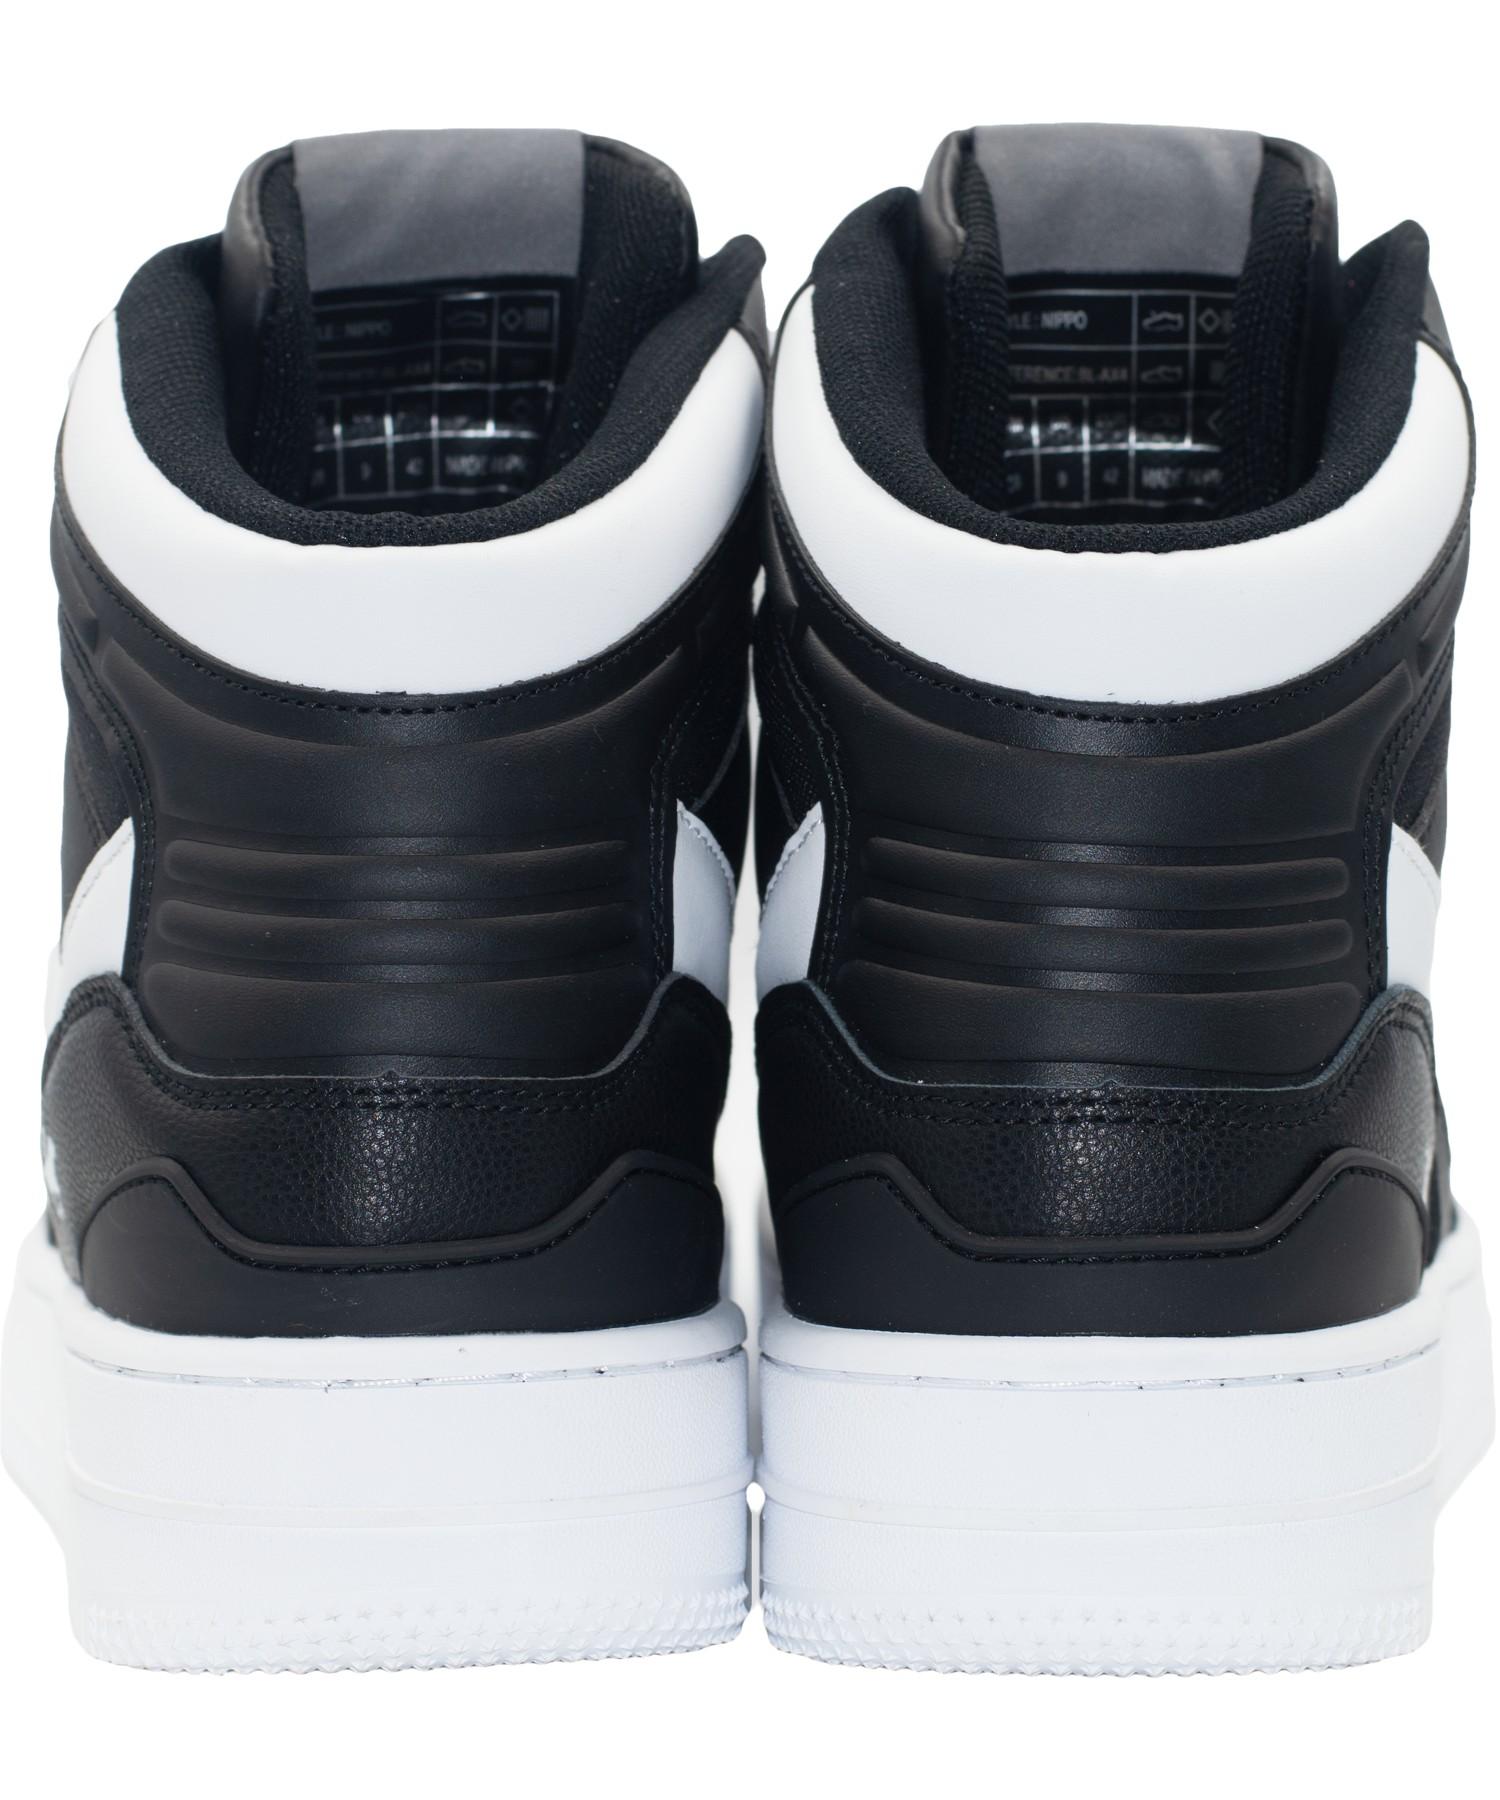 Zapatillas de Hombre Bhpc Nippo Caña Alta Negro-Blanco